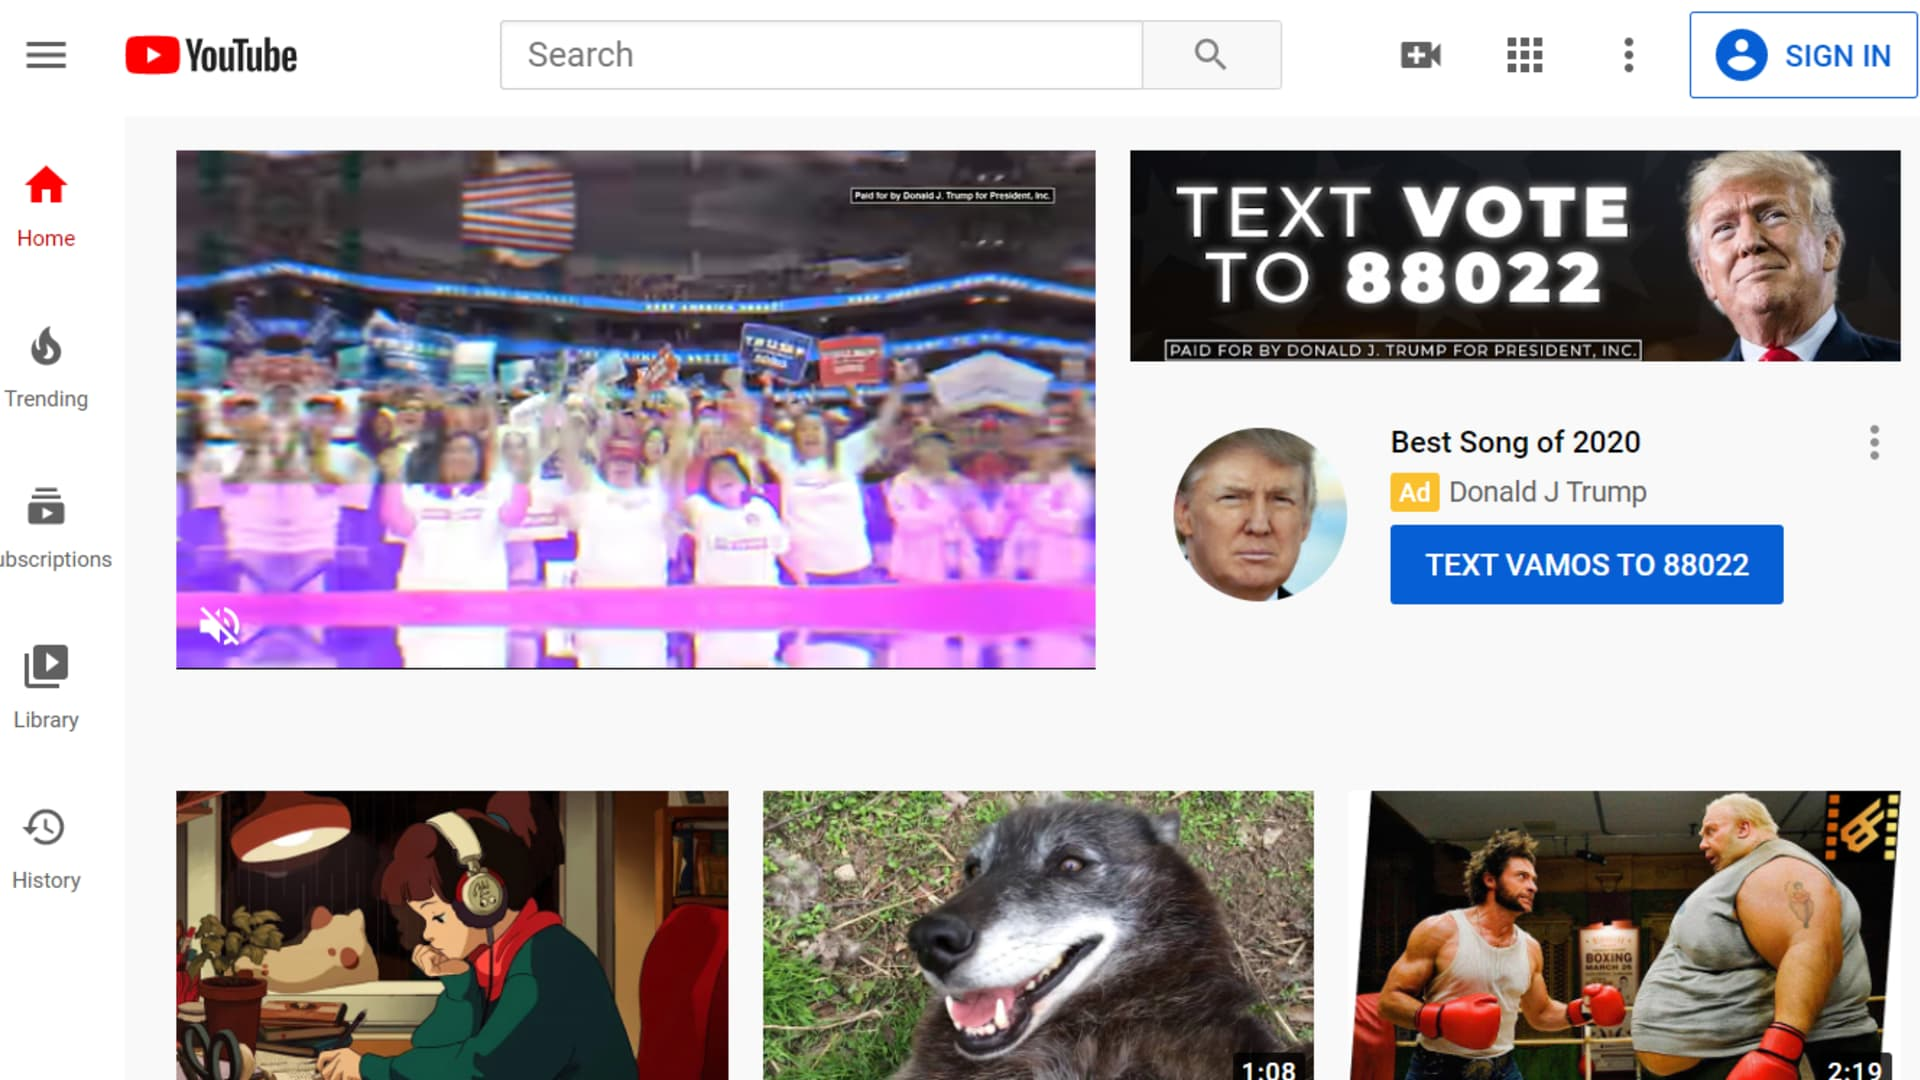 President Trump masthead ad on YouTube.